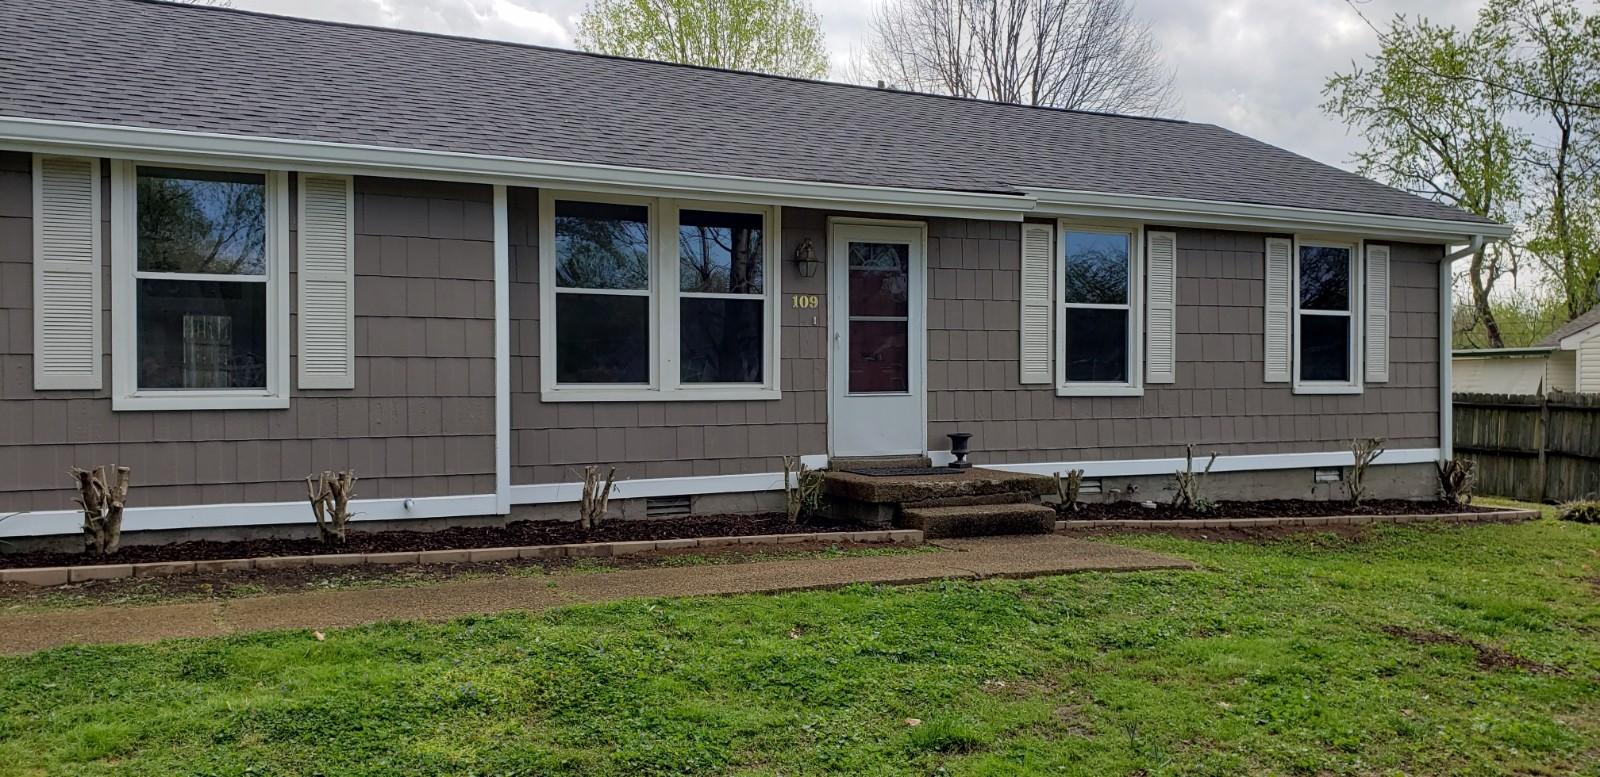 109 Pebble Creek Dr Property Photo - Hendersonville, TN real estate listing